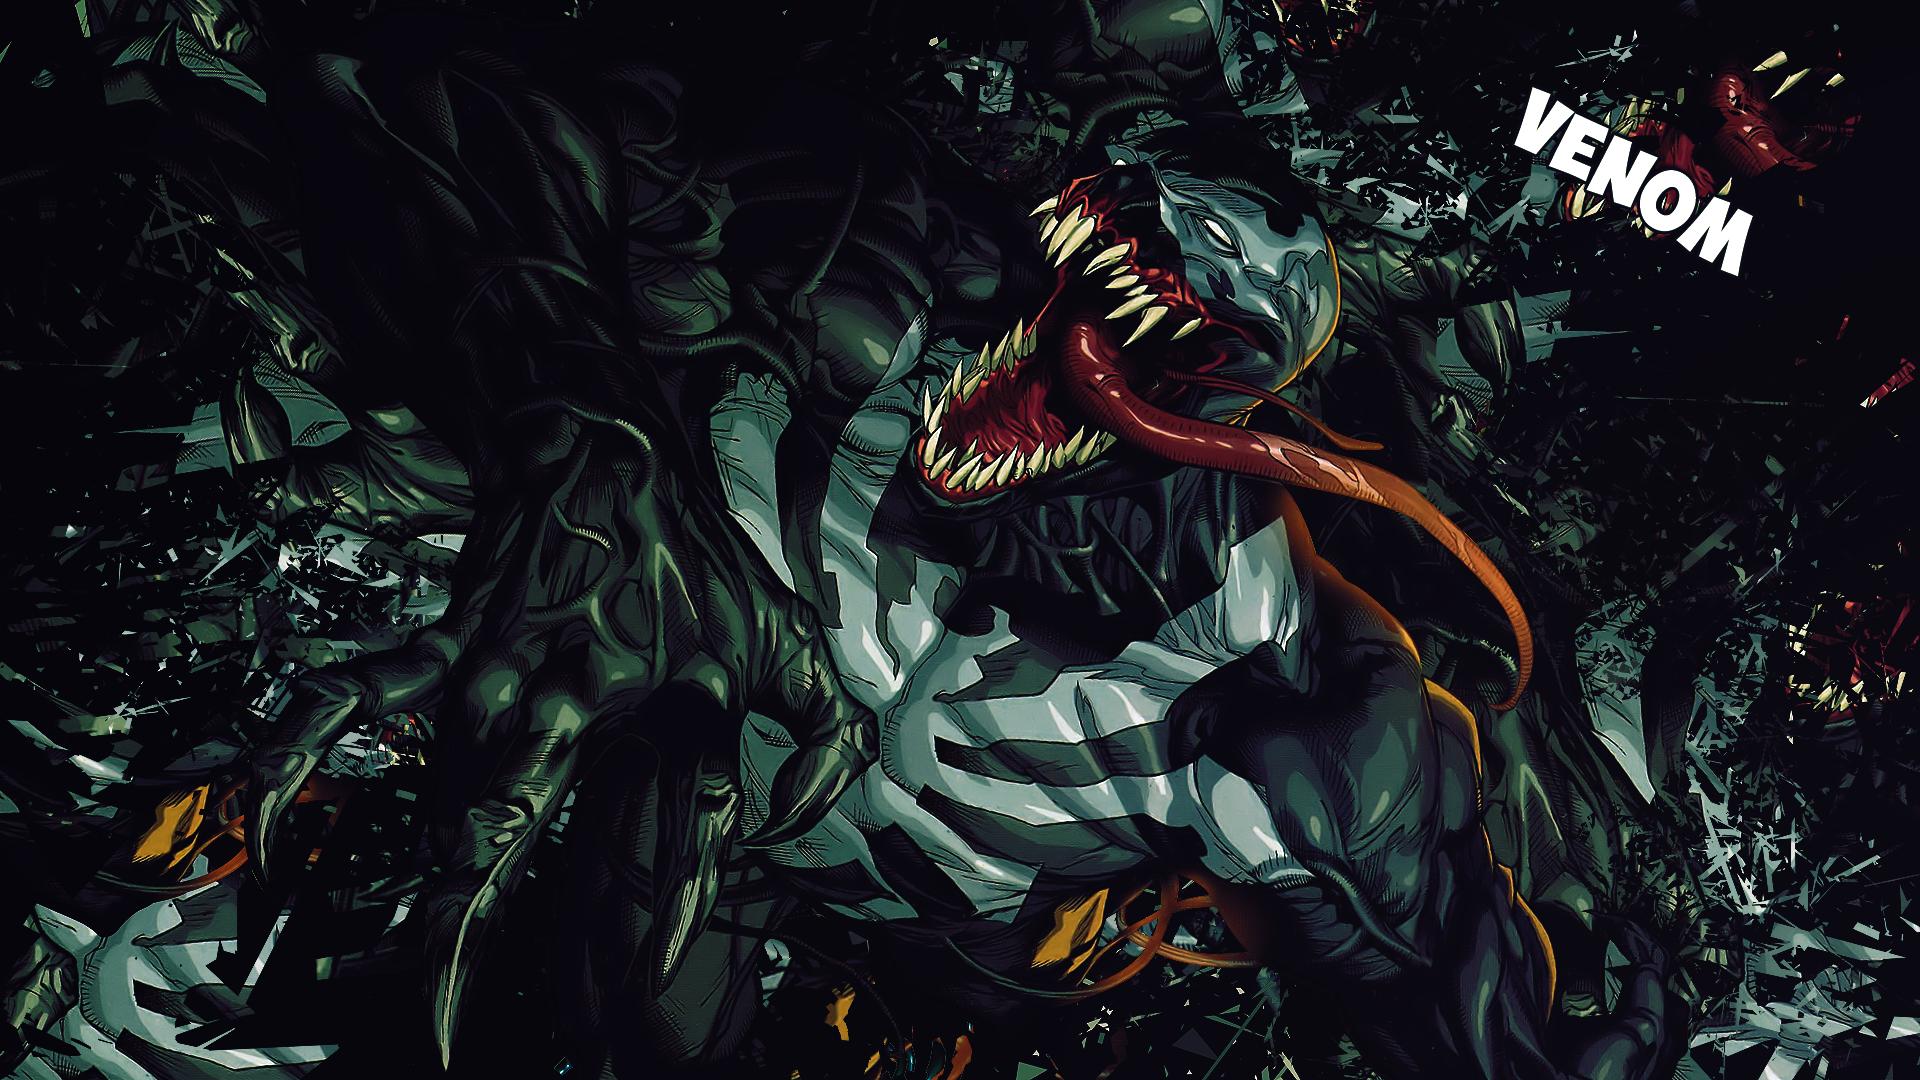 venom wallpaper hd 1920x1080 - photo #24